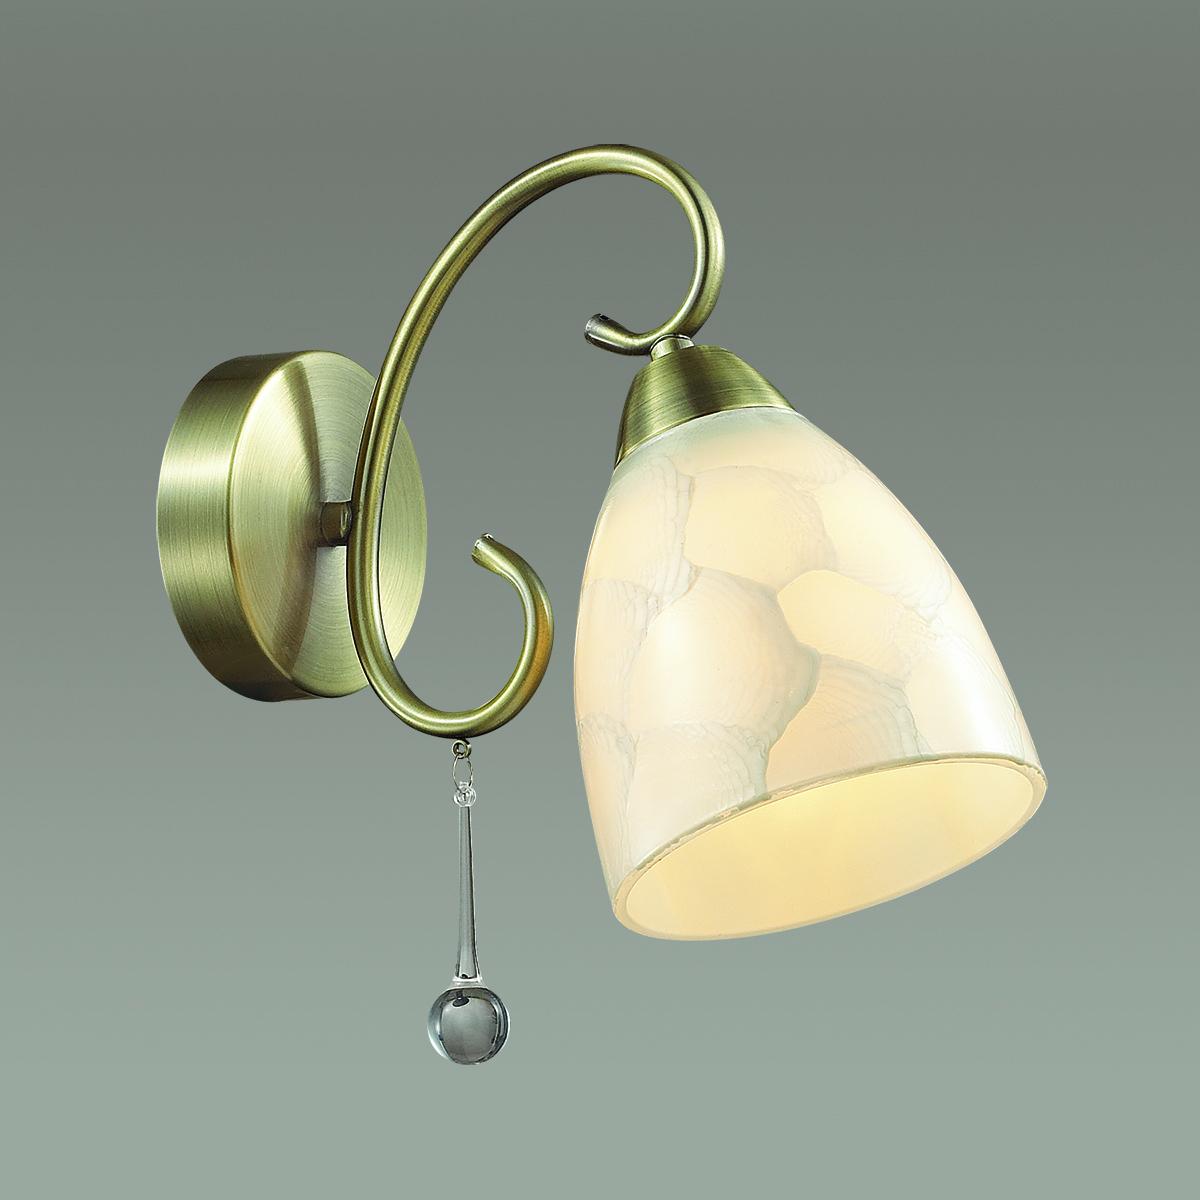 Бра Lumion Eleconca 3511/1W, 1xE27x60W, бронза, бежевый, прозрачный, металл, стекло - фото 3